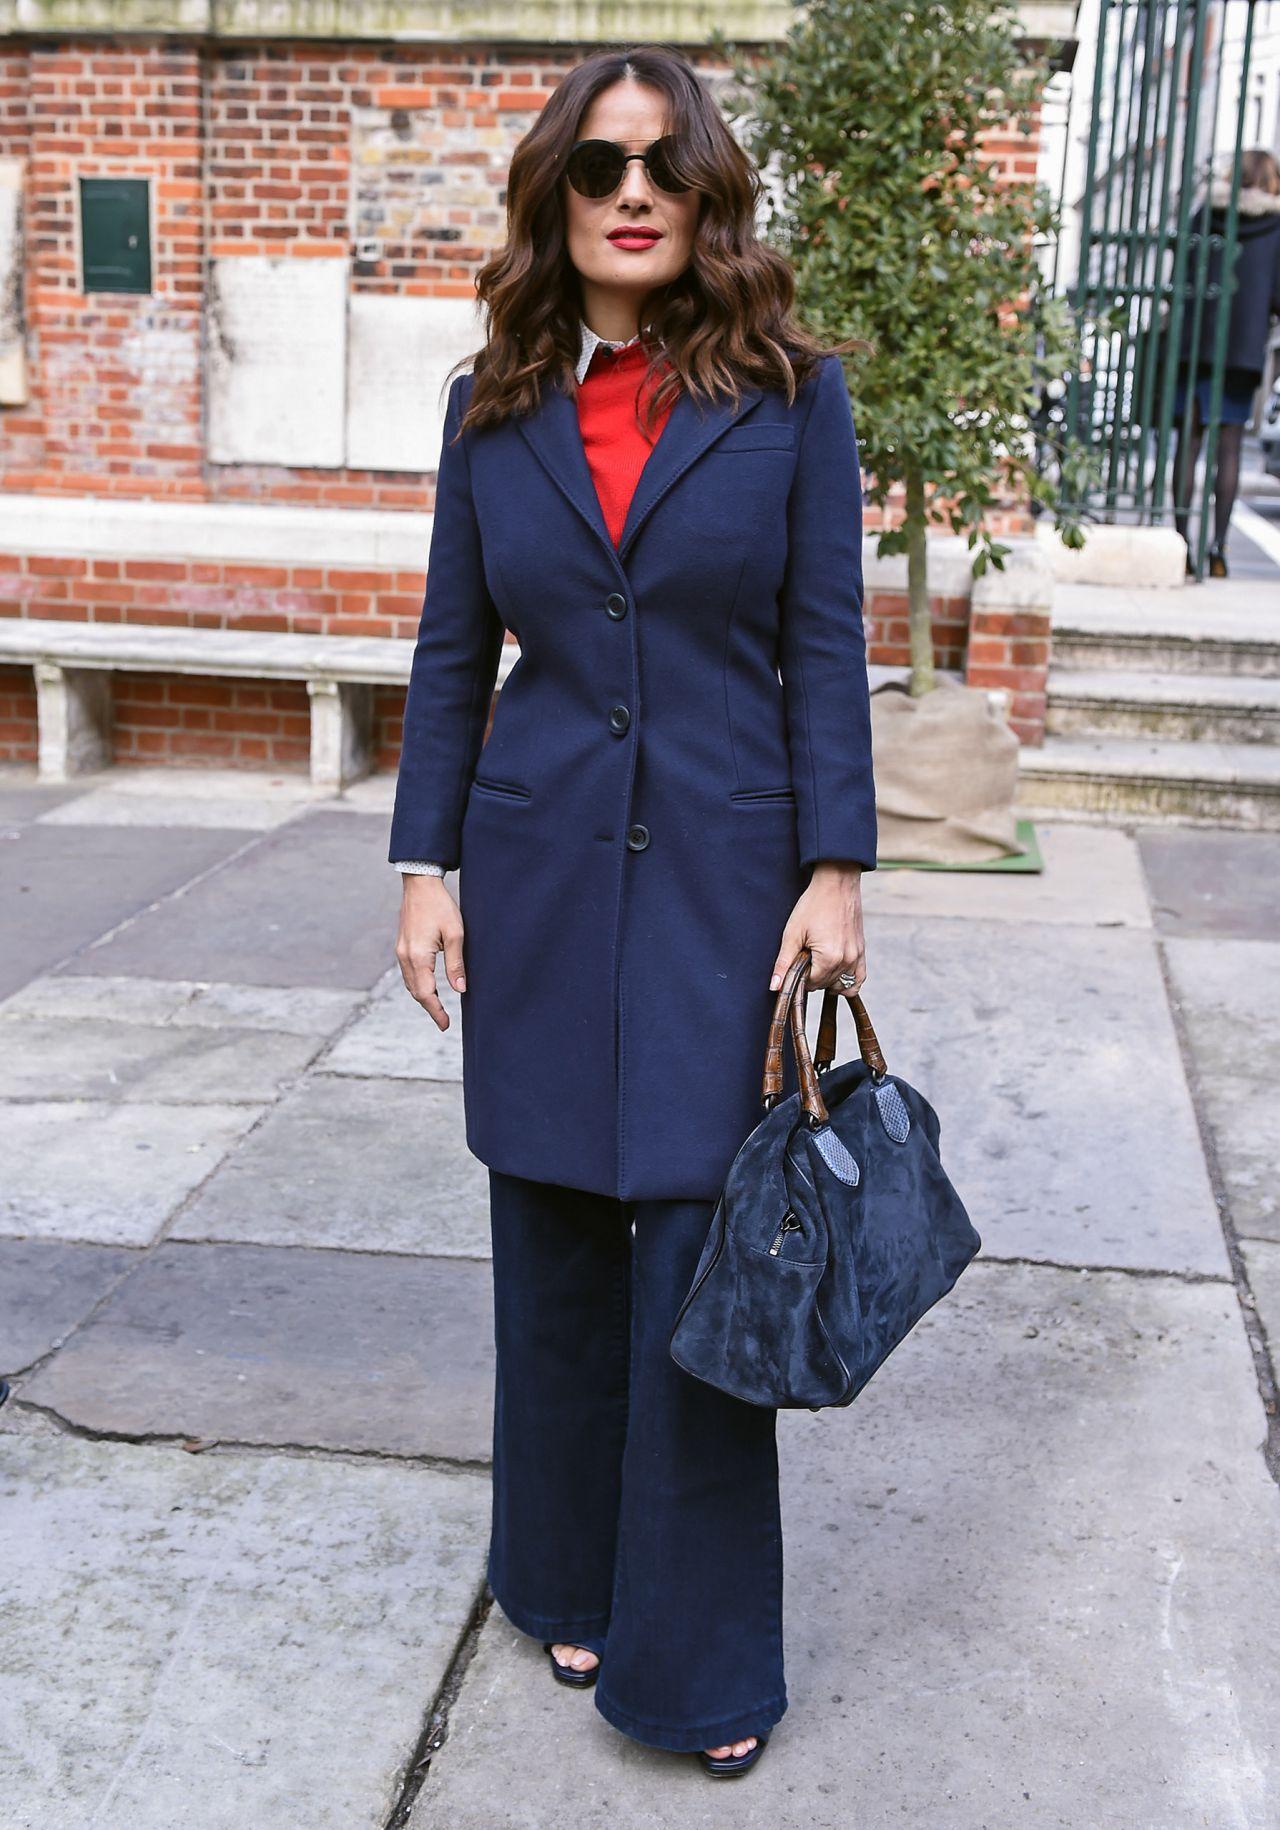 Salma Hayek Street Fashion Out In London March 2015